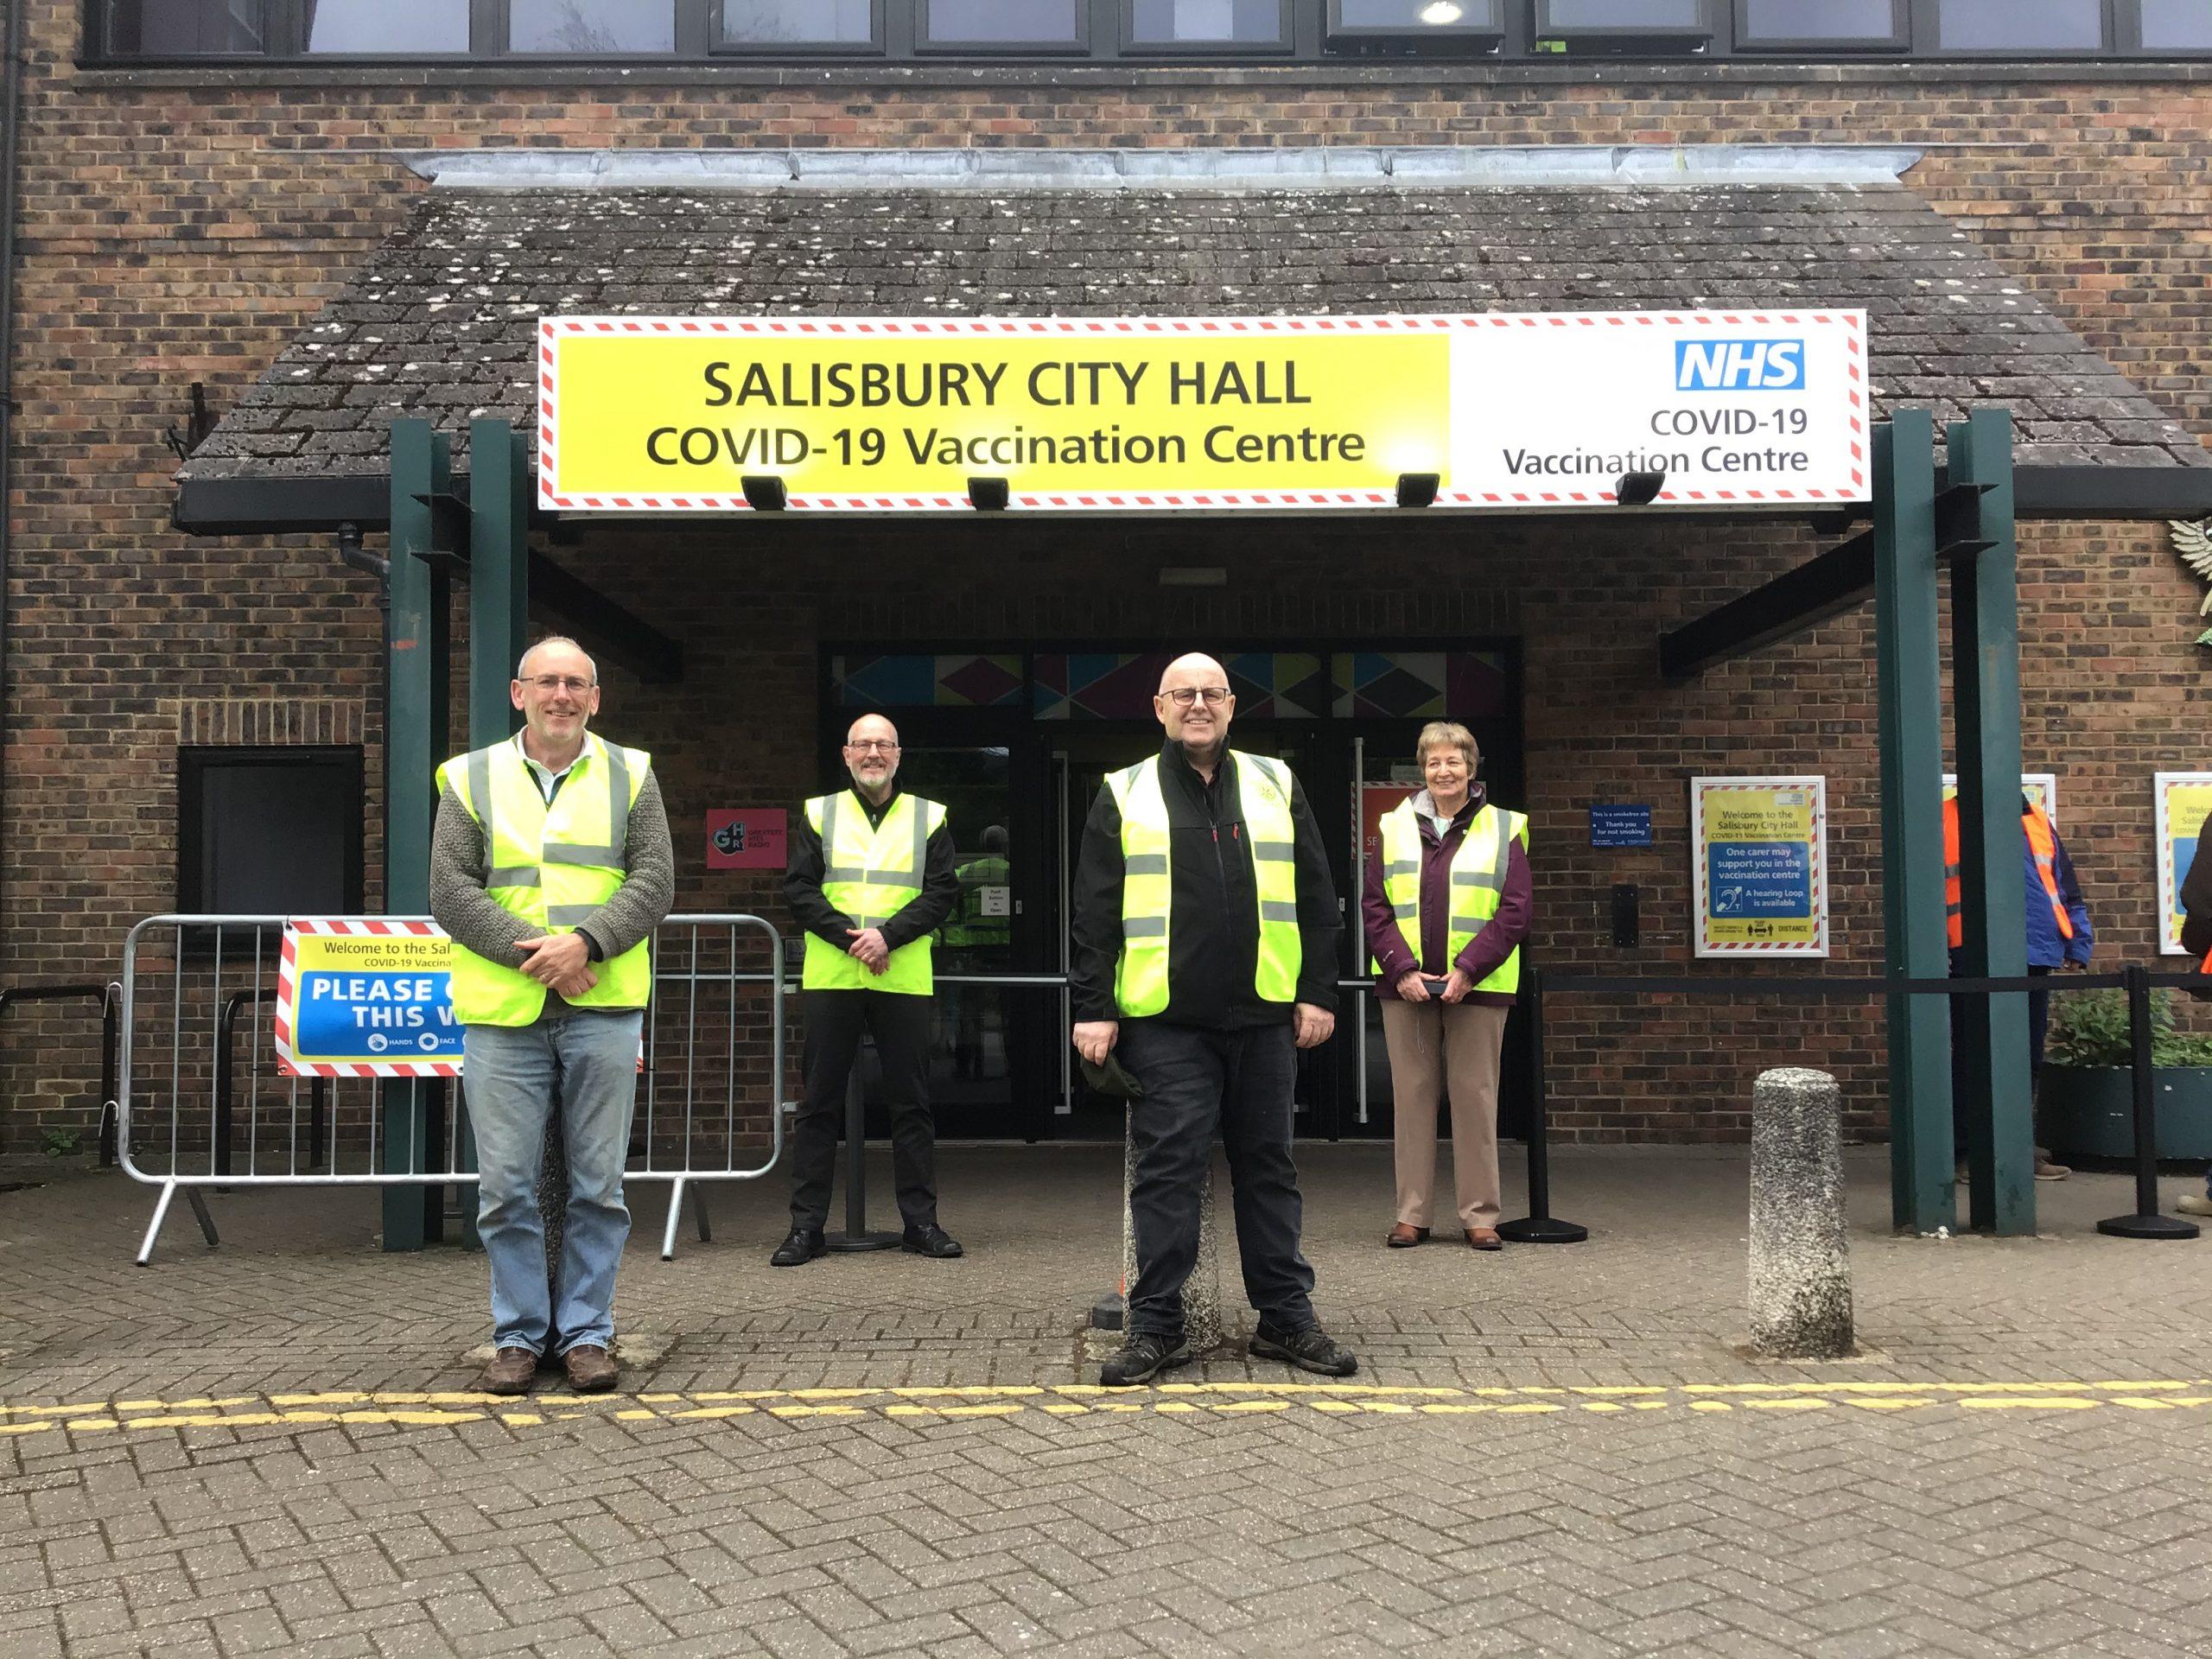 Sarum-Rotary-Volunteers-For-COVID-19-Vaccination-Centre-City-Hall-Salisbury